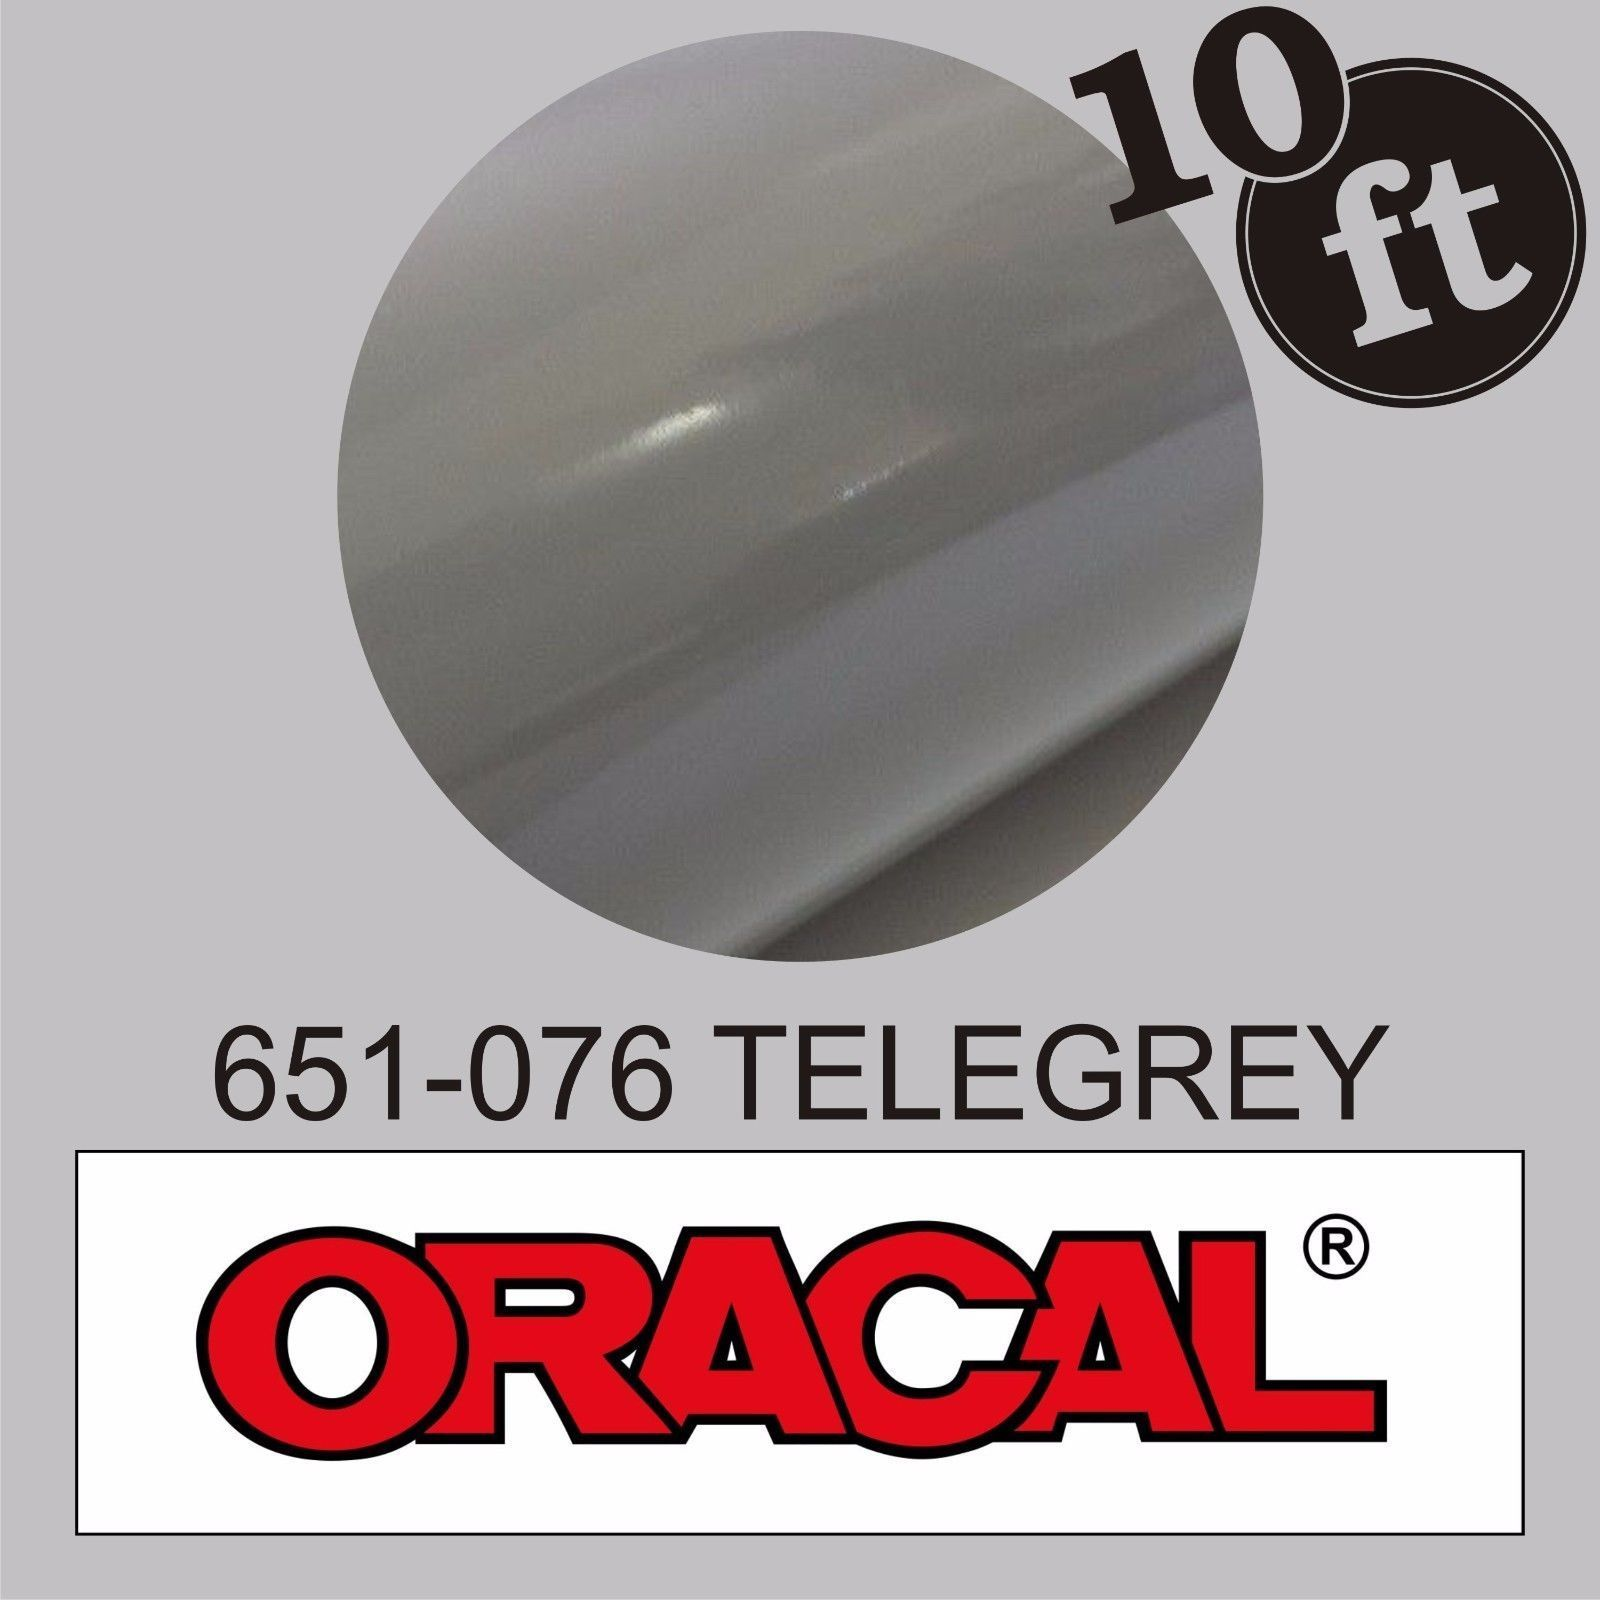 12 In X 10 Ft Gloss Telegrey Oracal 651 Adhesive Vinyl 076 Cutter Plotter Adhesive Vinyl Adhesive Ebay